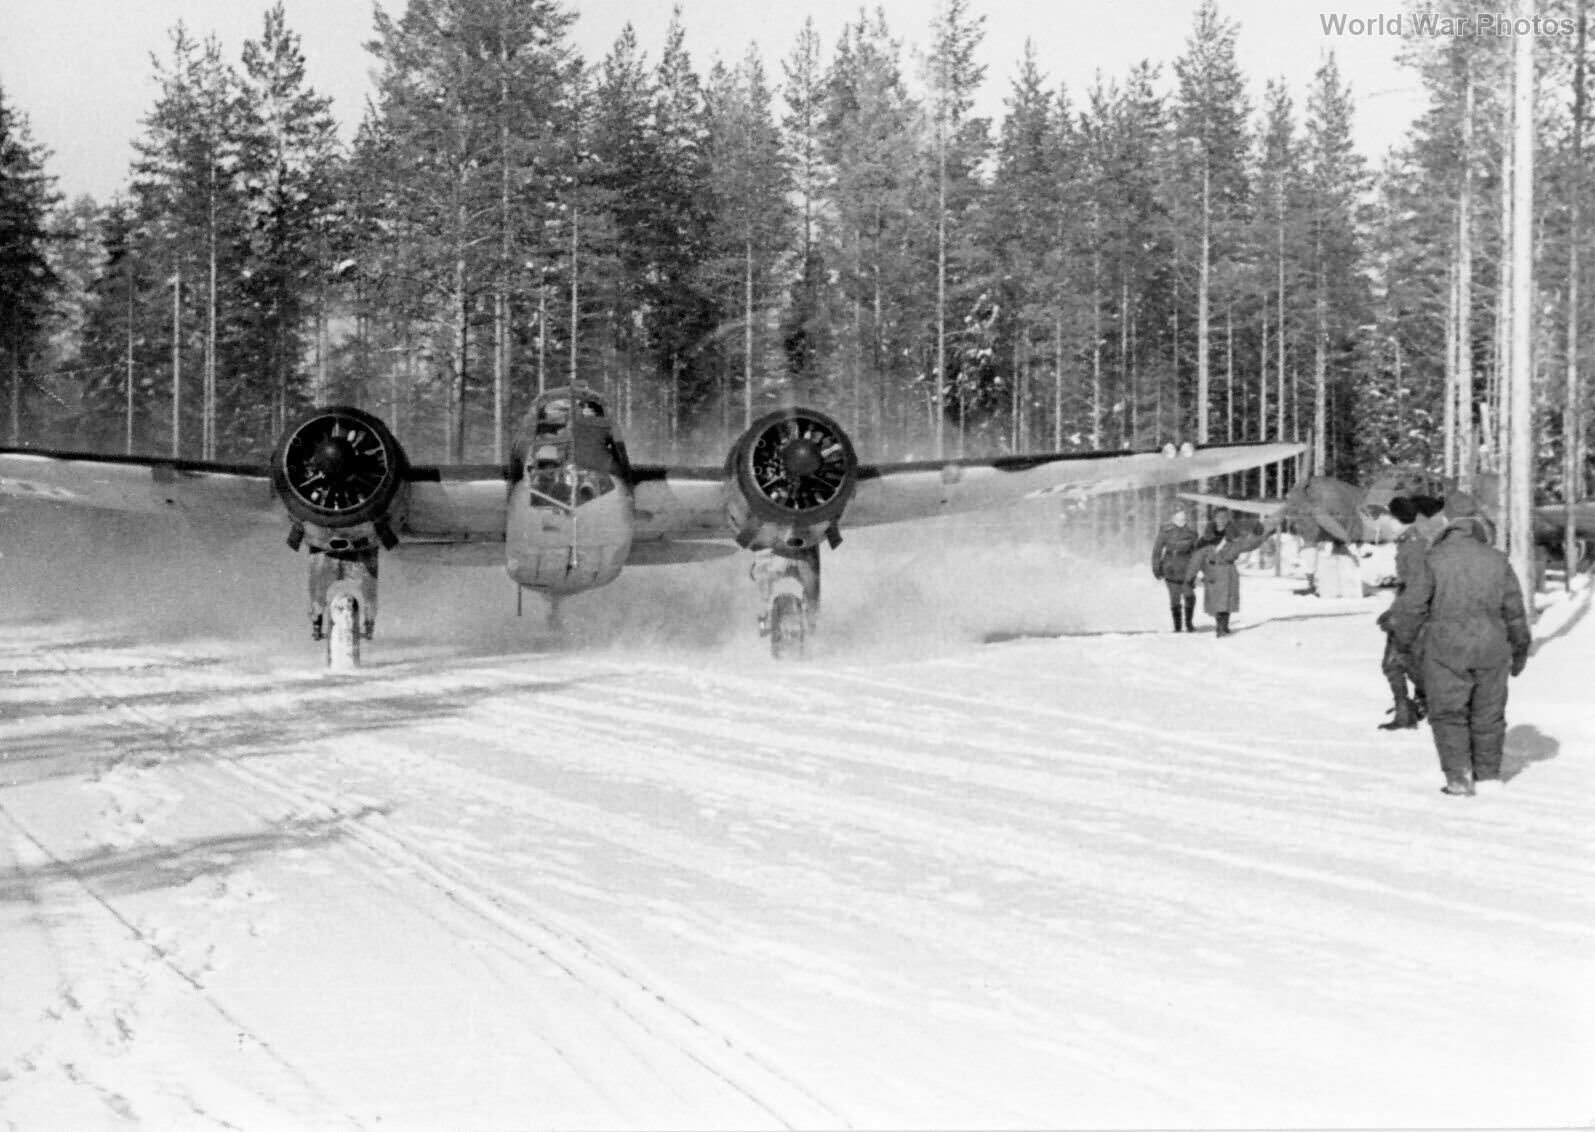 Blenheim Finland